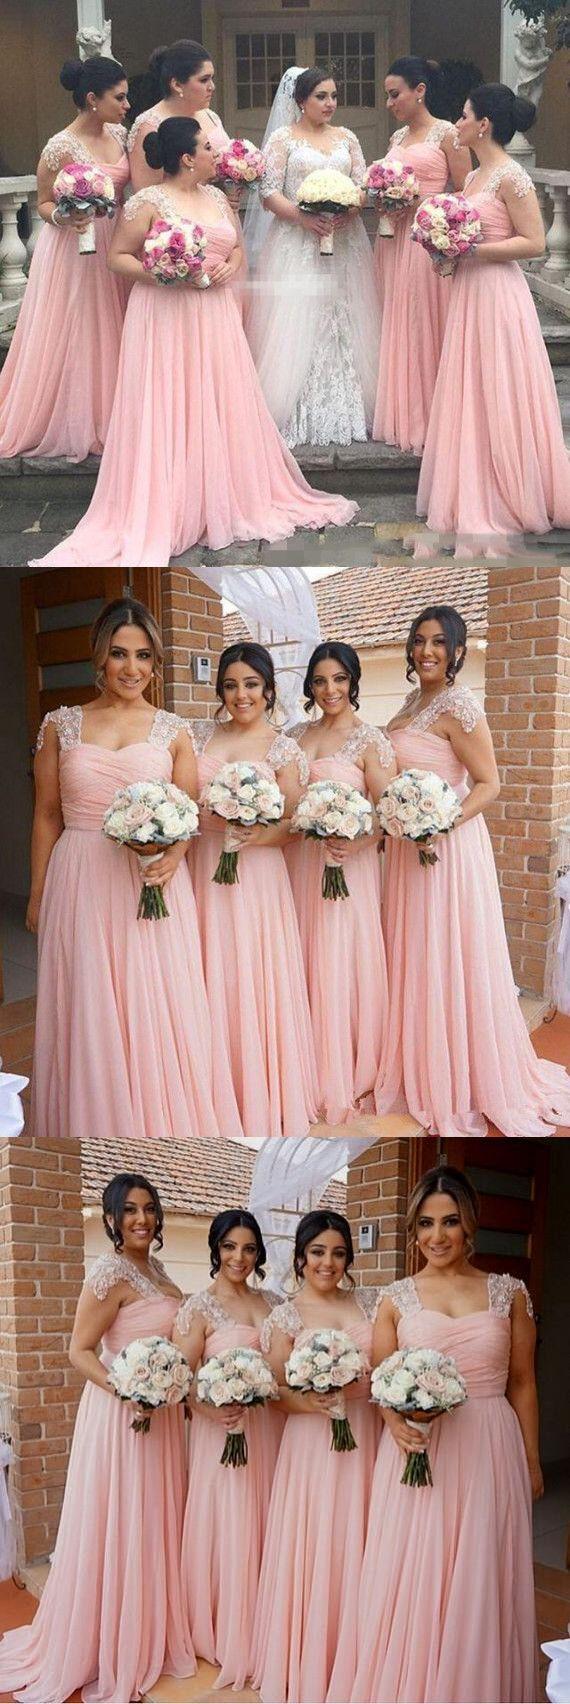 2139 best bridesmaids images on pinterest bridal flowers bridal 2017 bridesmaid dress pink long bridesmaid dress ombrellifo Gallery